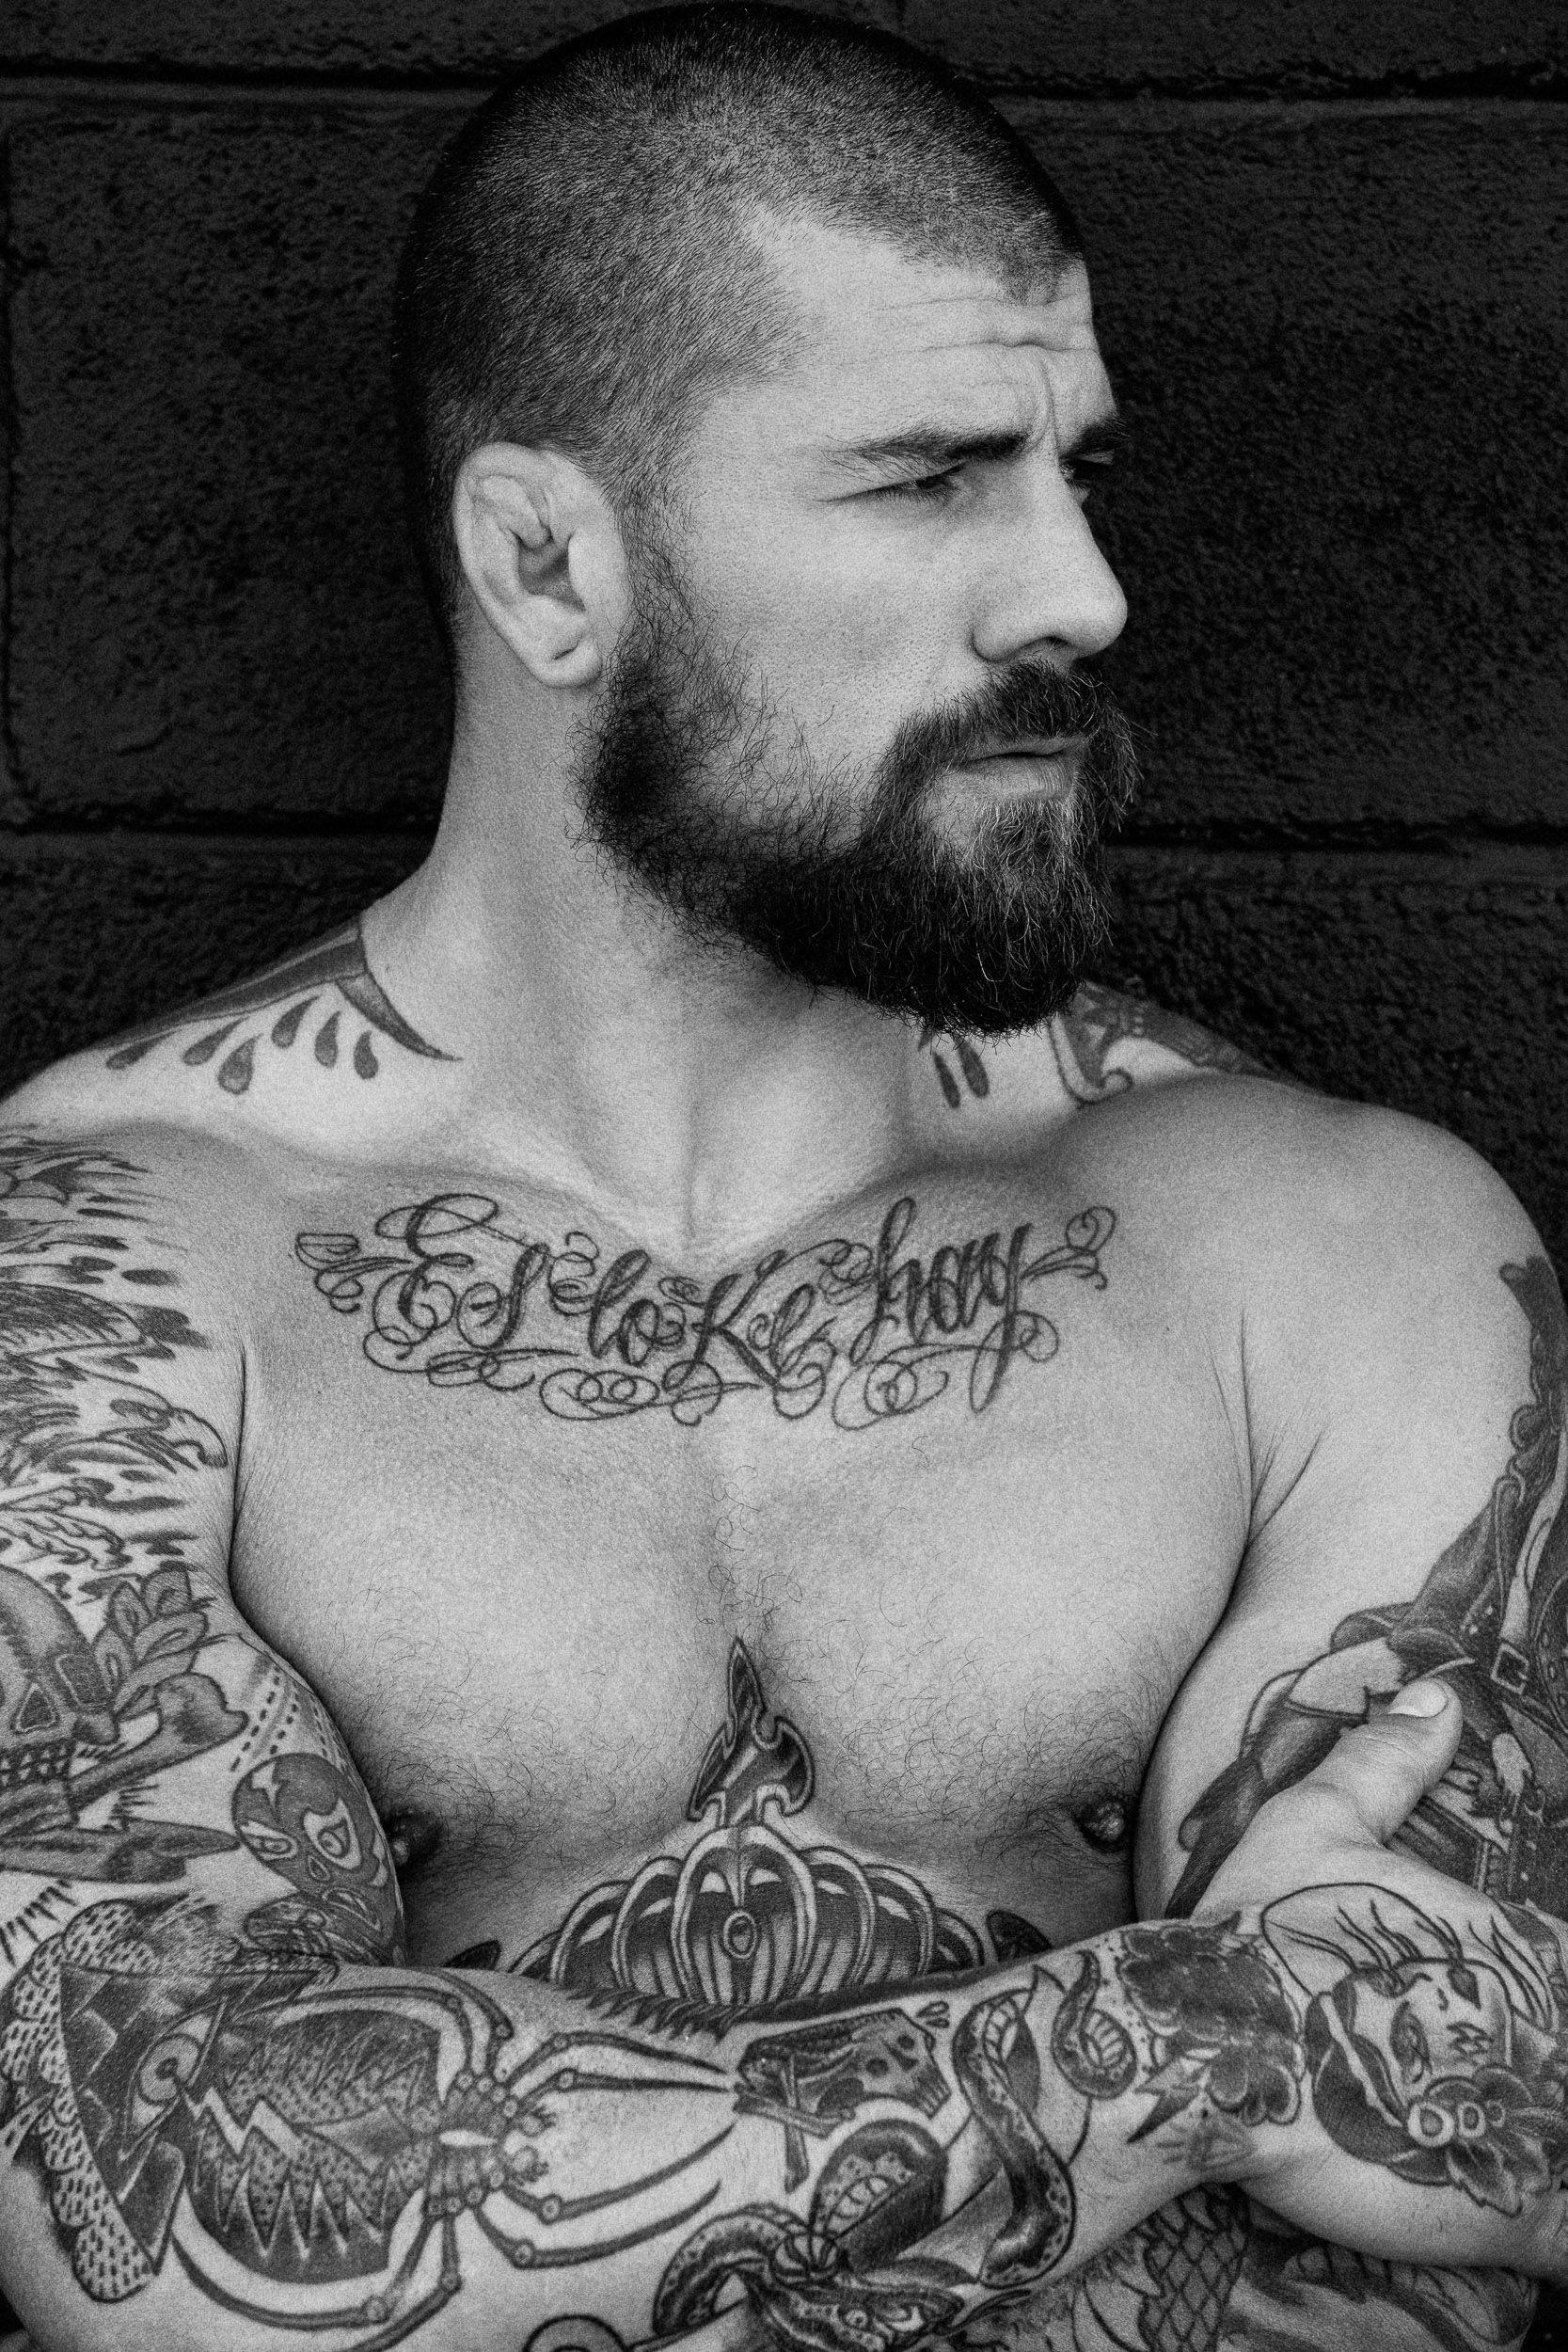 e92fb61c3 Adam levine tattoos pin by niu papelo on beard grr pinterest tattoos ...